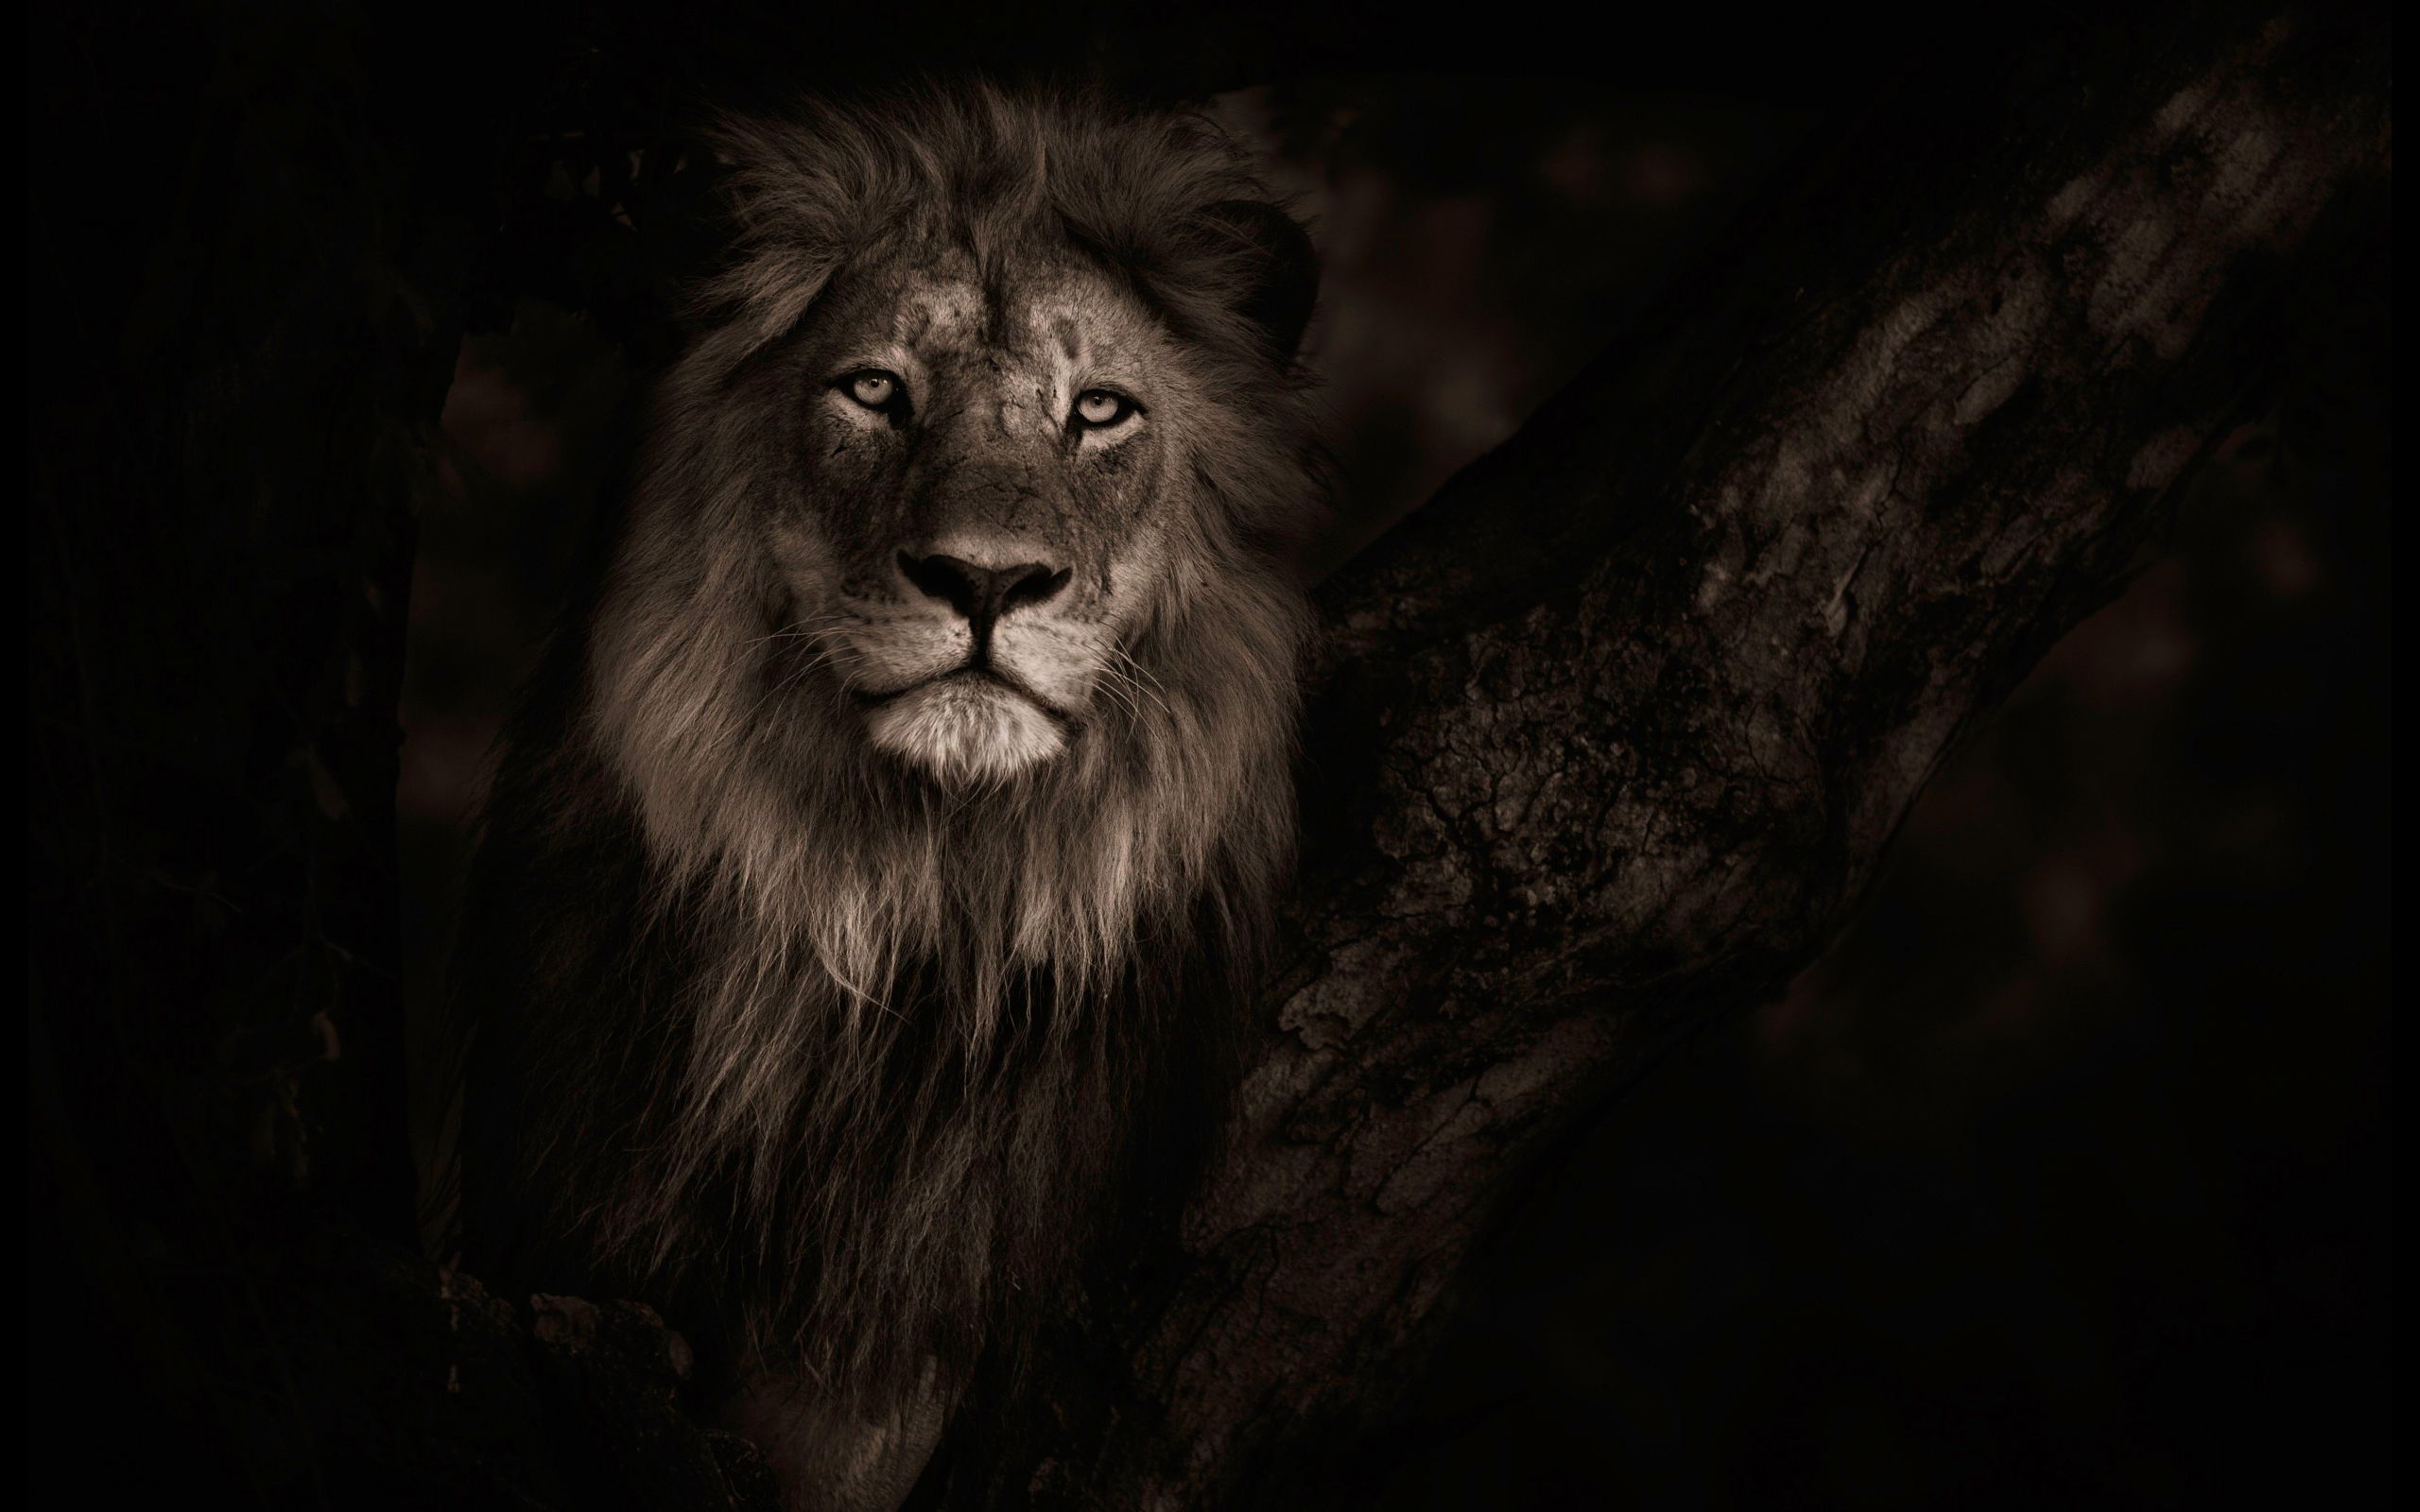 Wallpaper iphone lion - Wallpaper Backgrounds